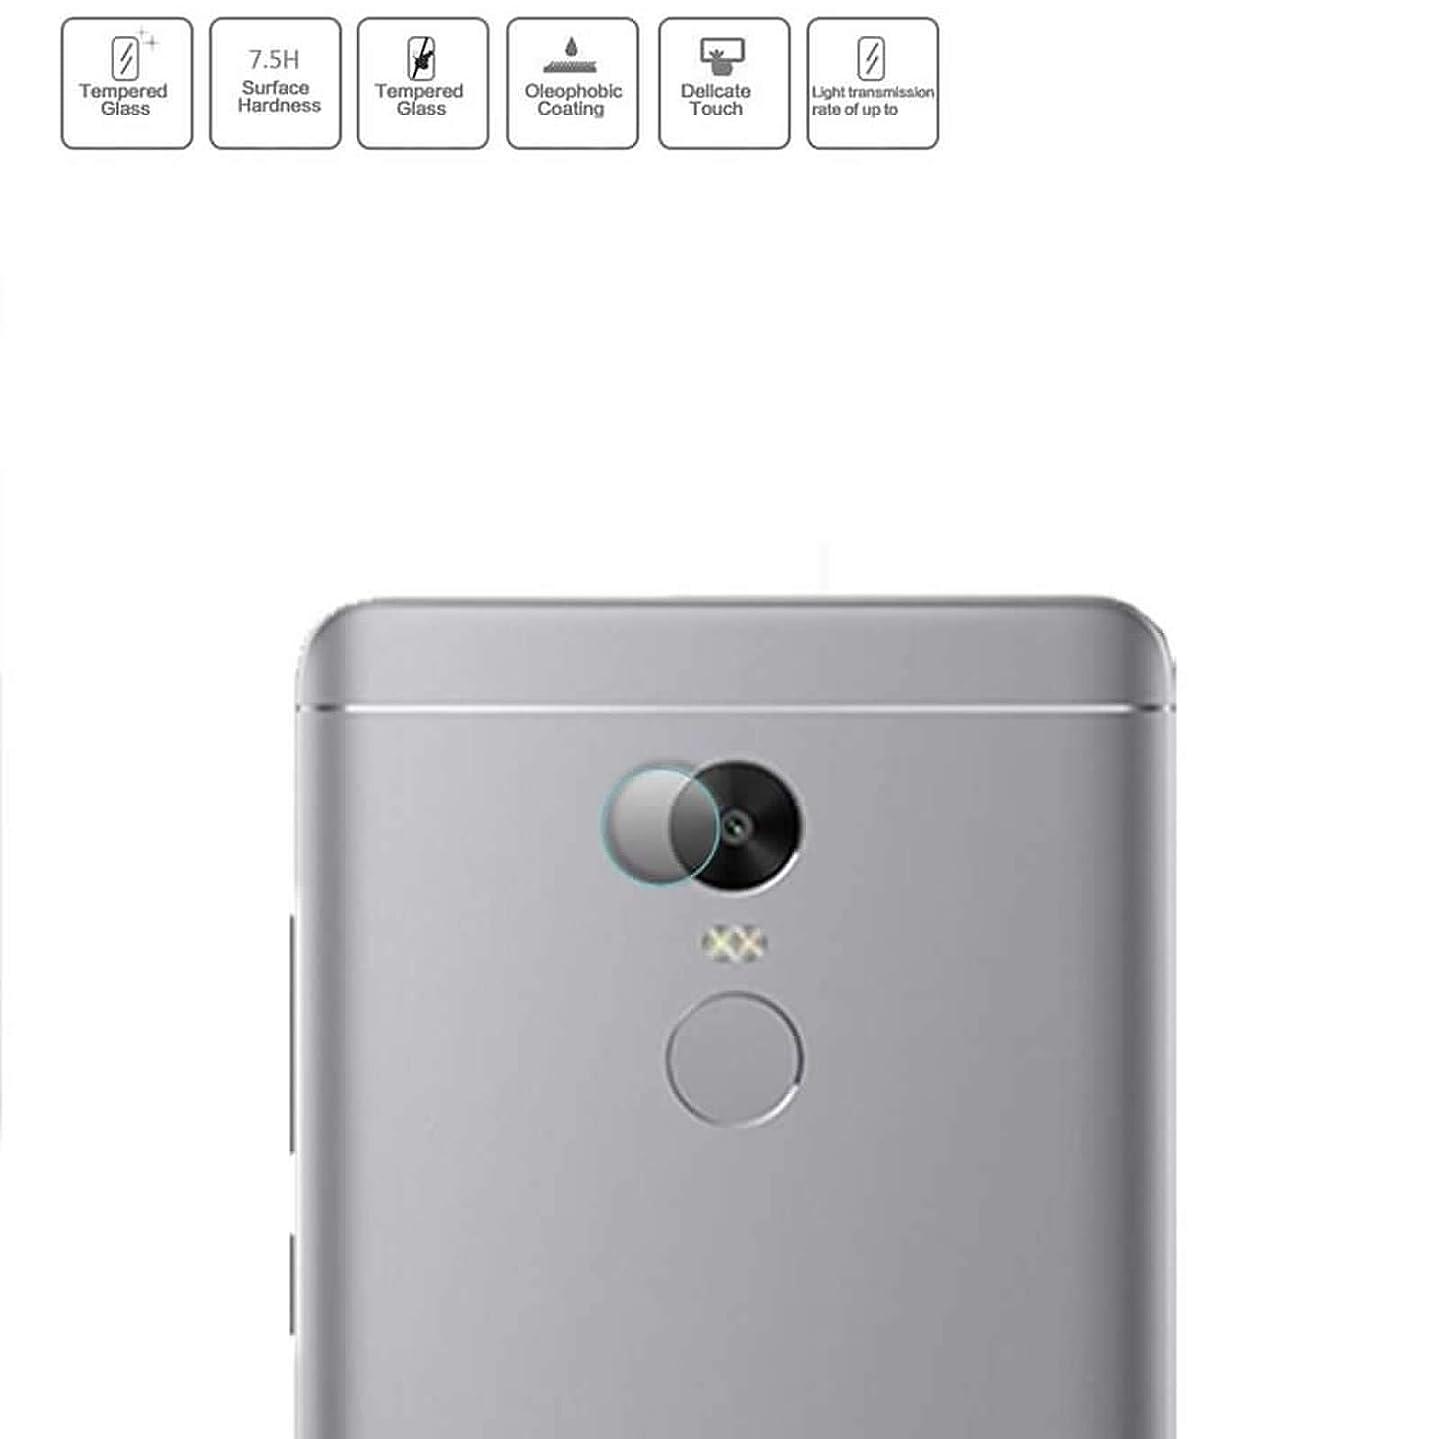 Superior ZRL 2.5D 7.5H Back Transparent Camera Lens Tempered Glass Protector Film for Xiaomi MIX/MIX2/MIX 2S/ Redmi 5/5 Plus/Note 5